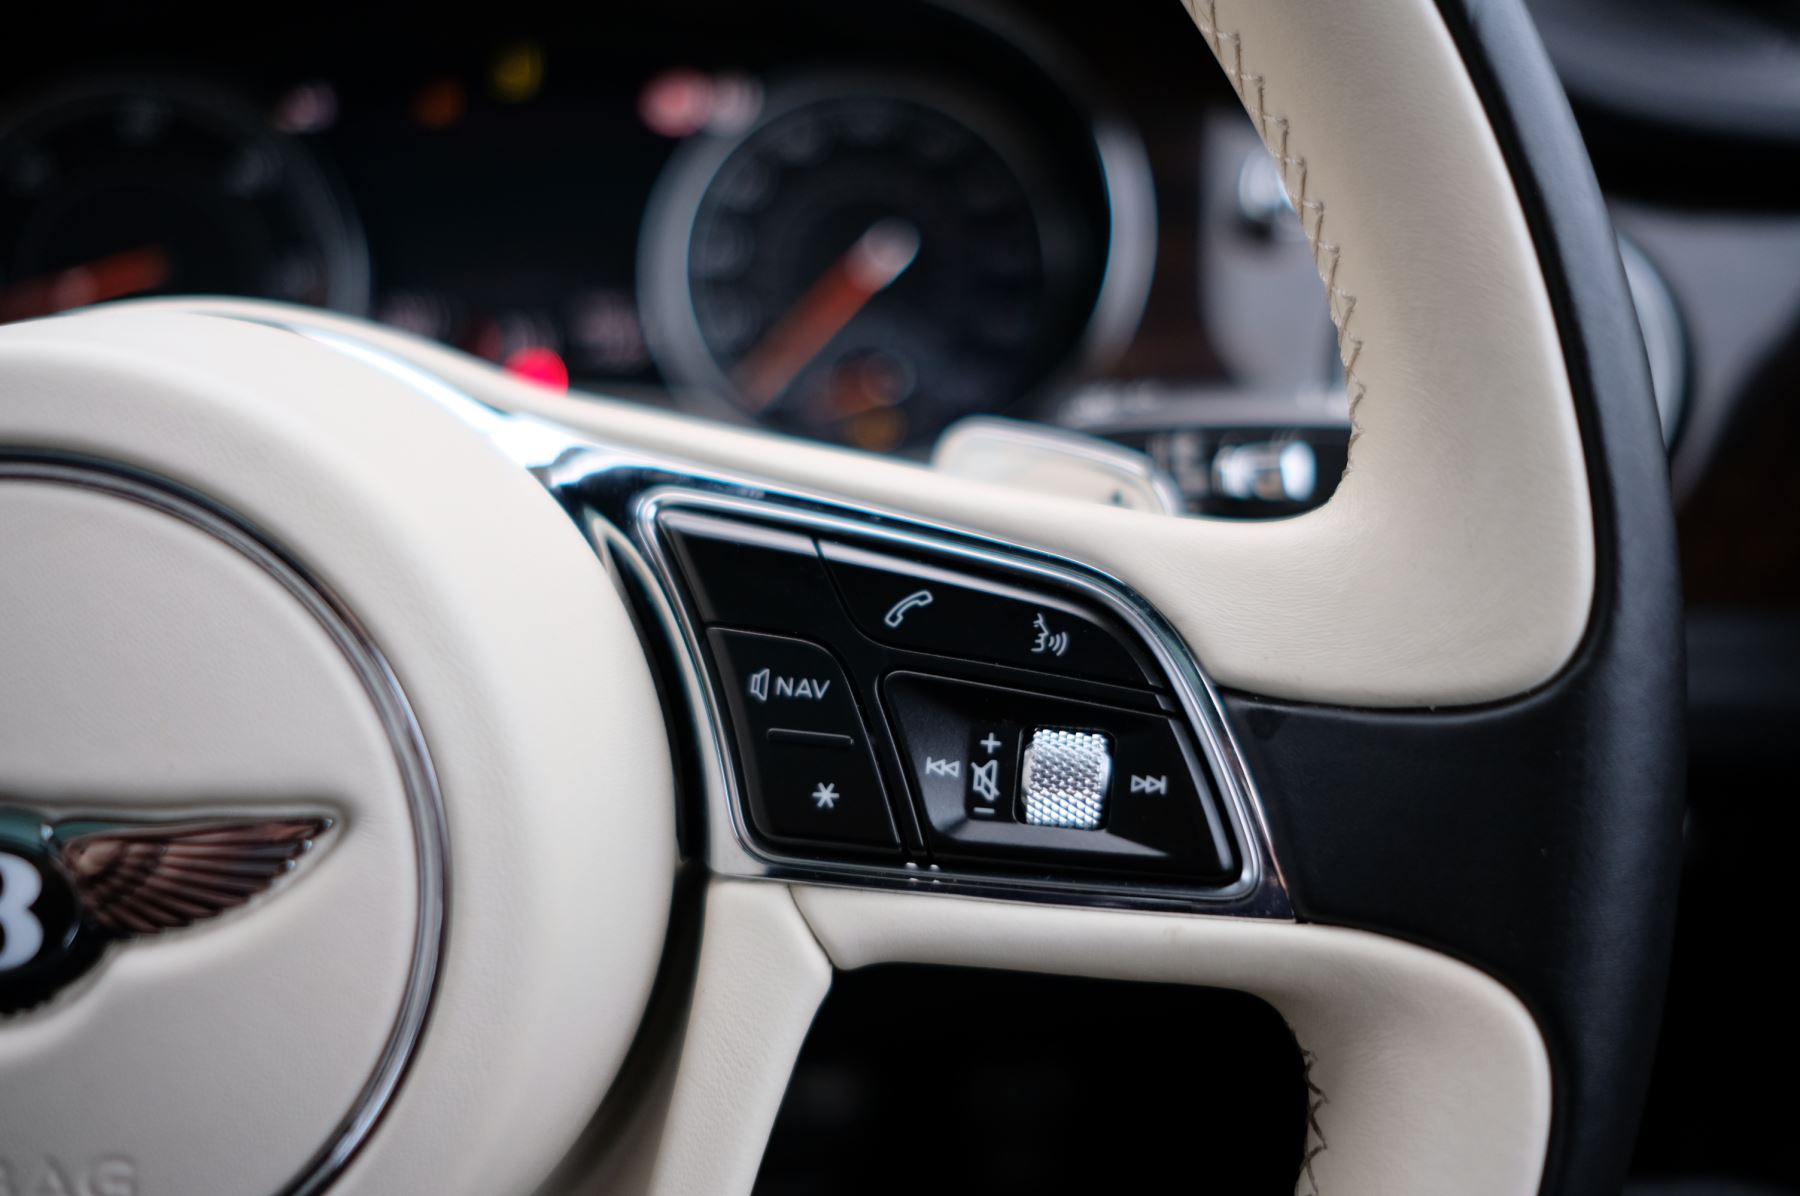 Bentley Bentayga Diesel 4.0 V8 Mulliner Driving Spec 5dr Auto - 7 Seat Specification image 27